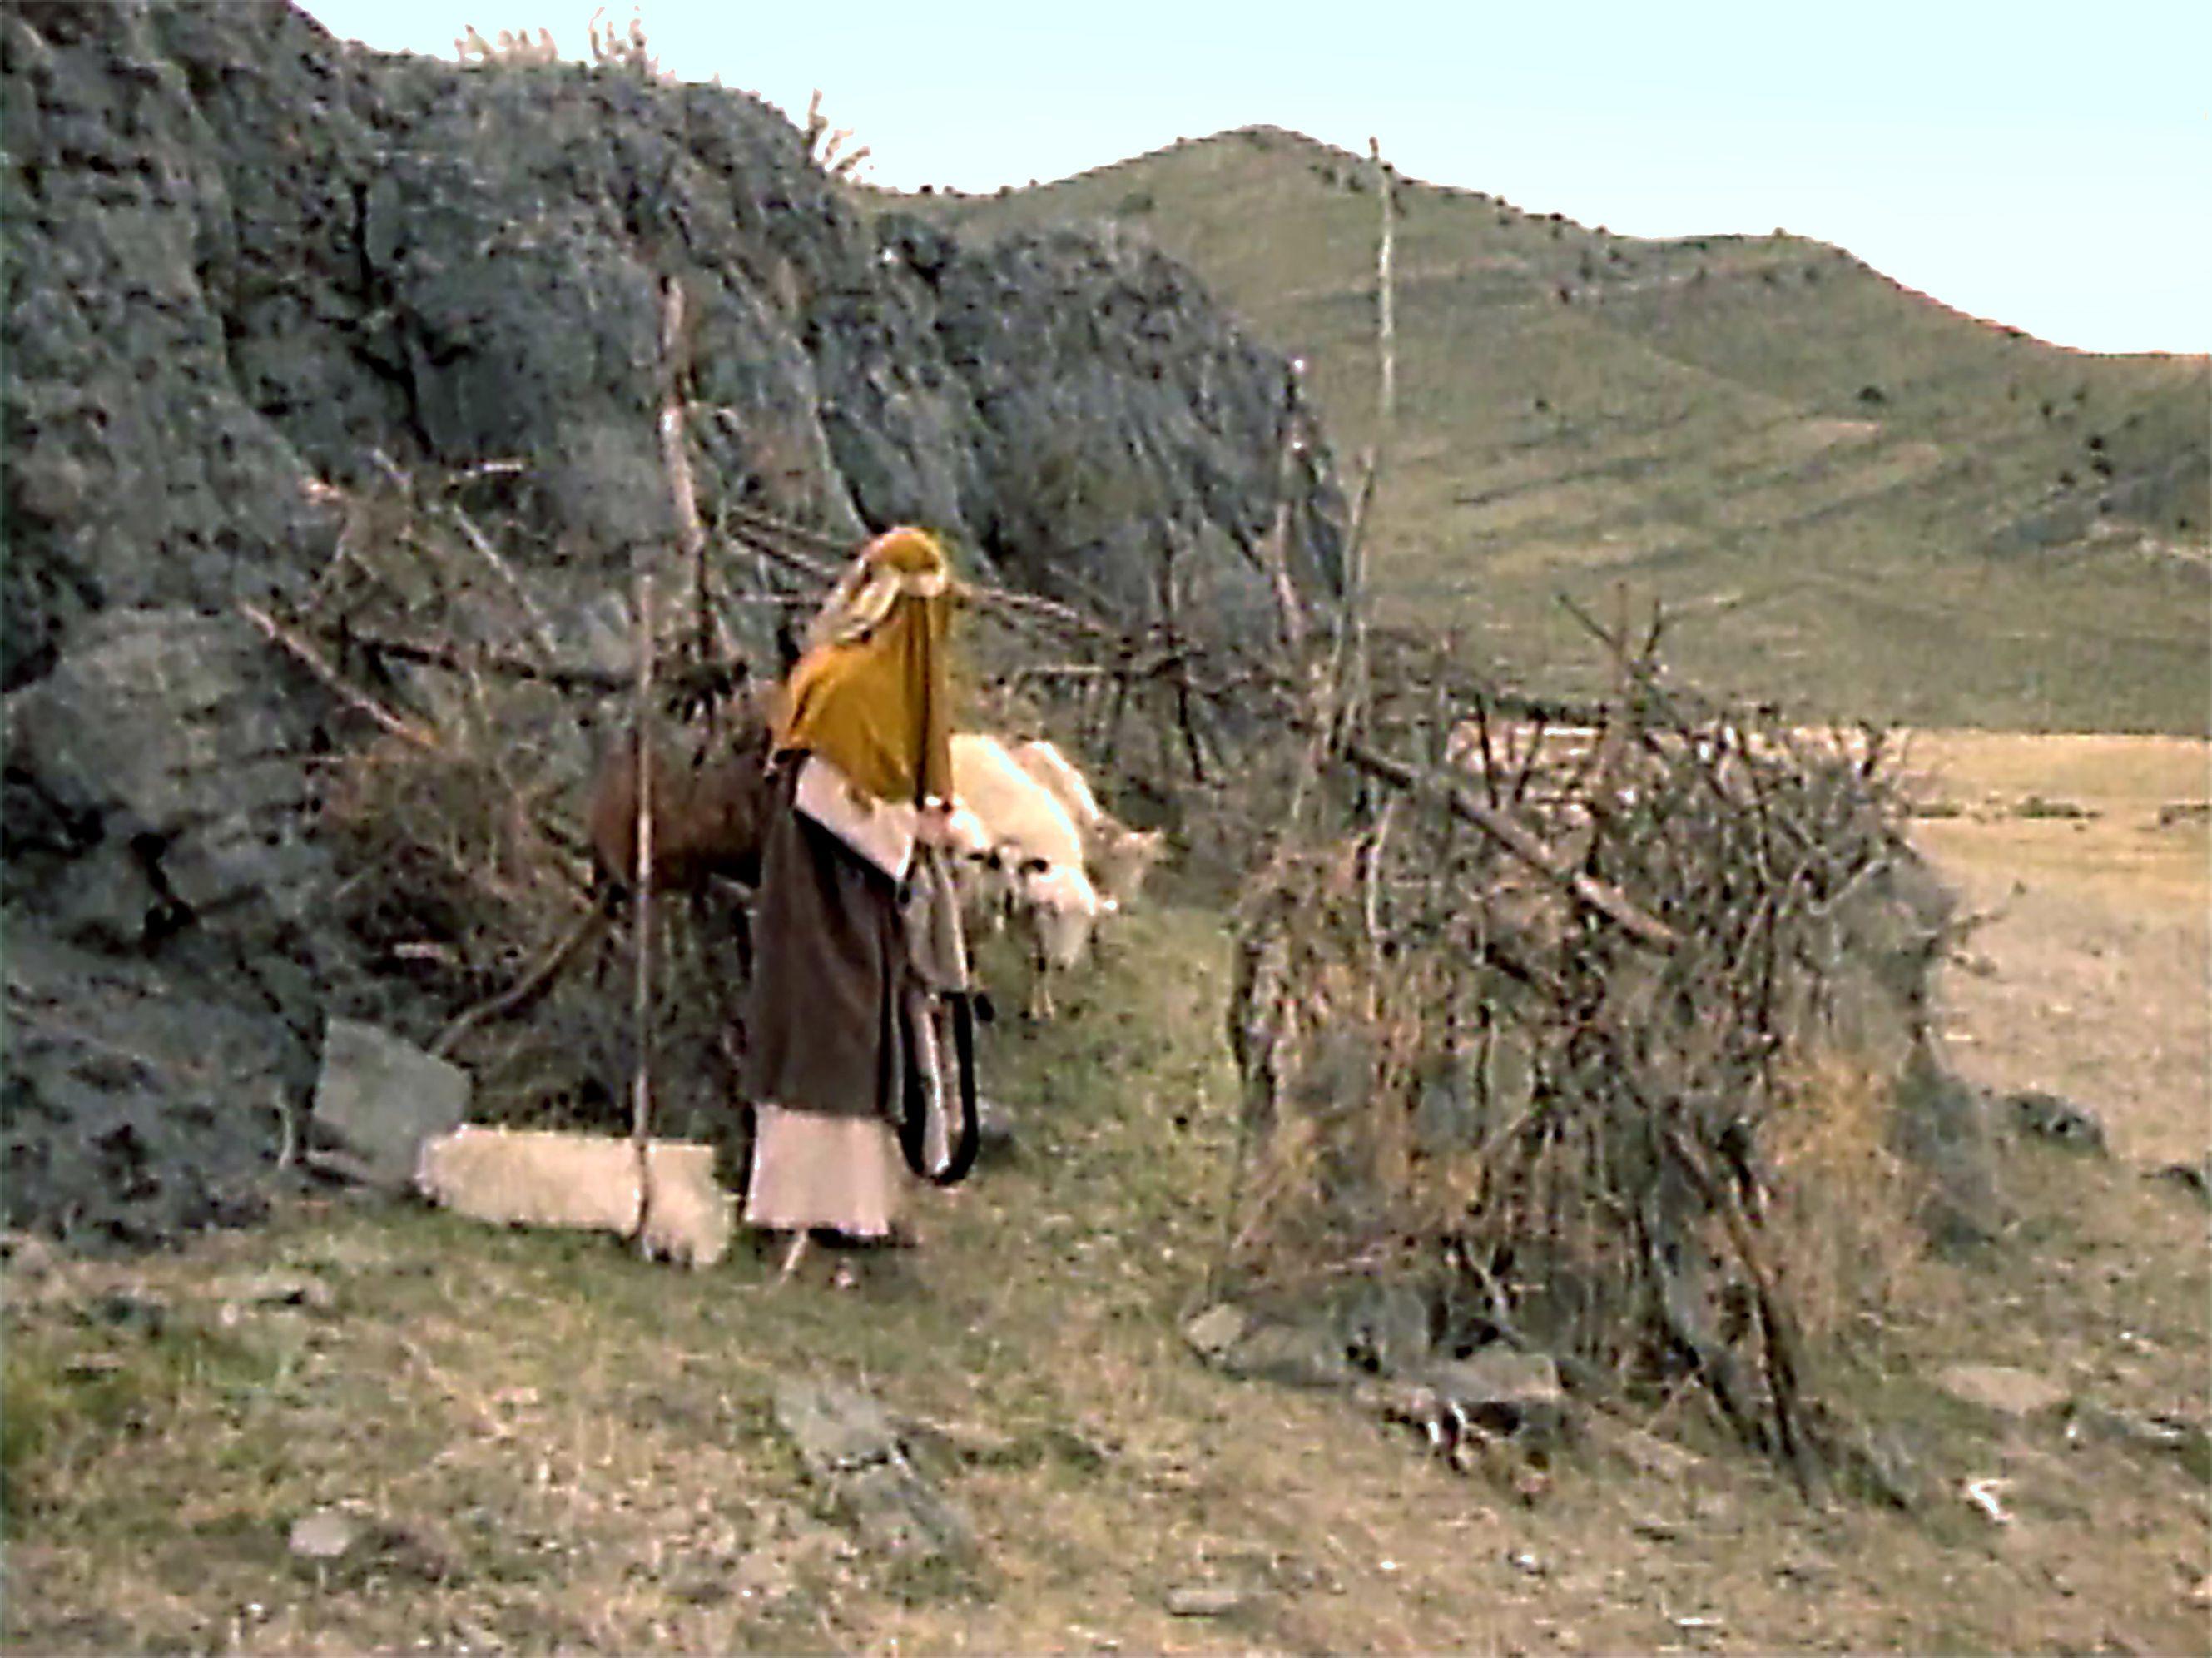 A shepherd leading his sheep.